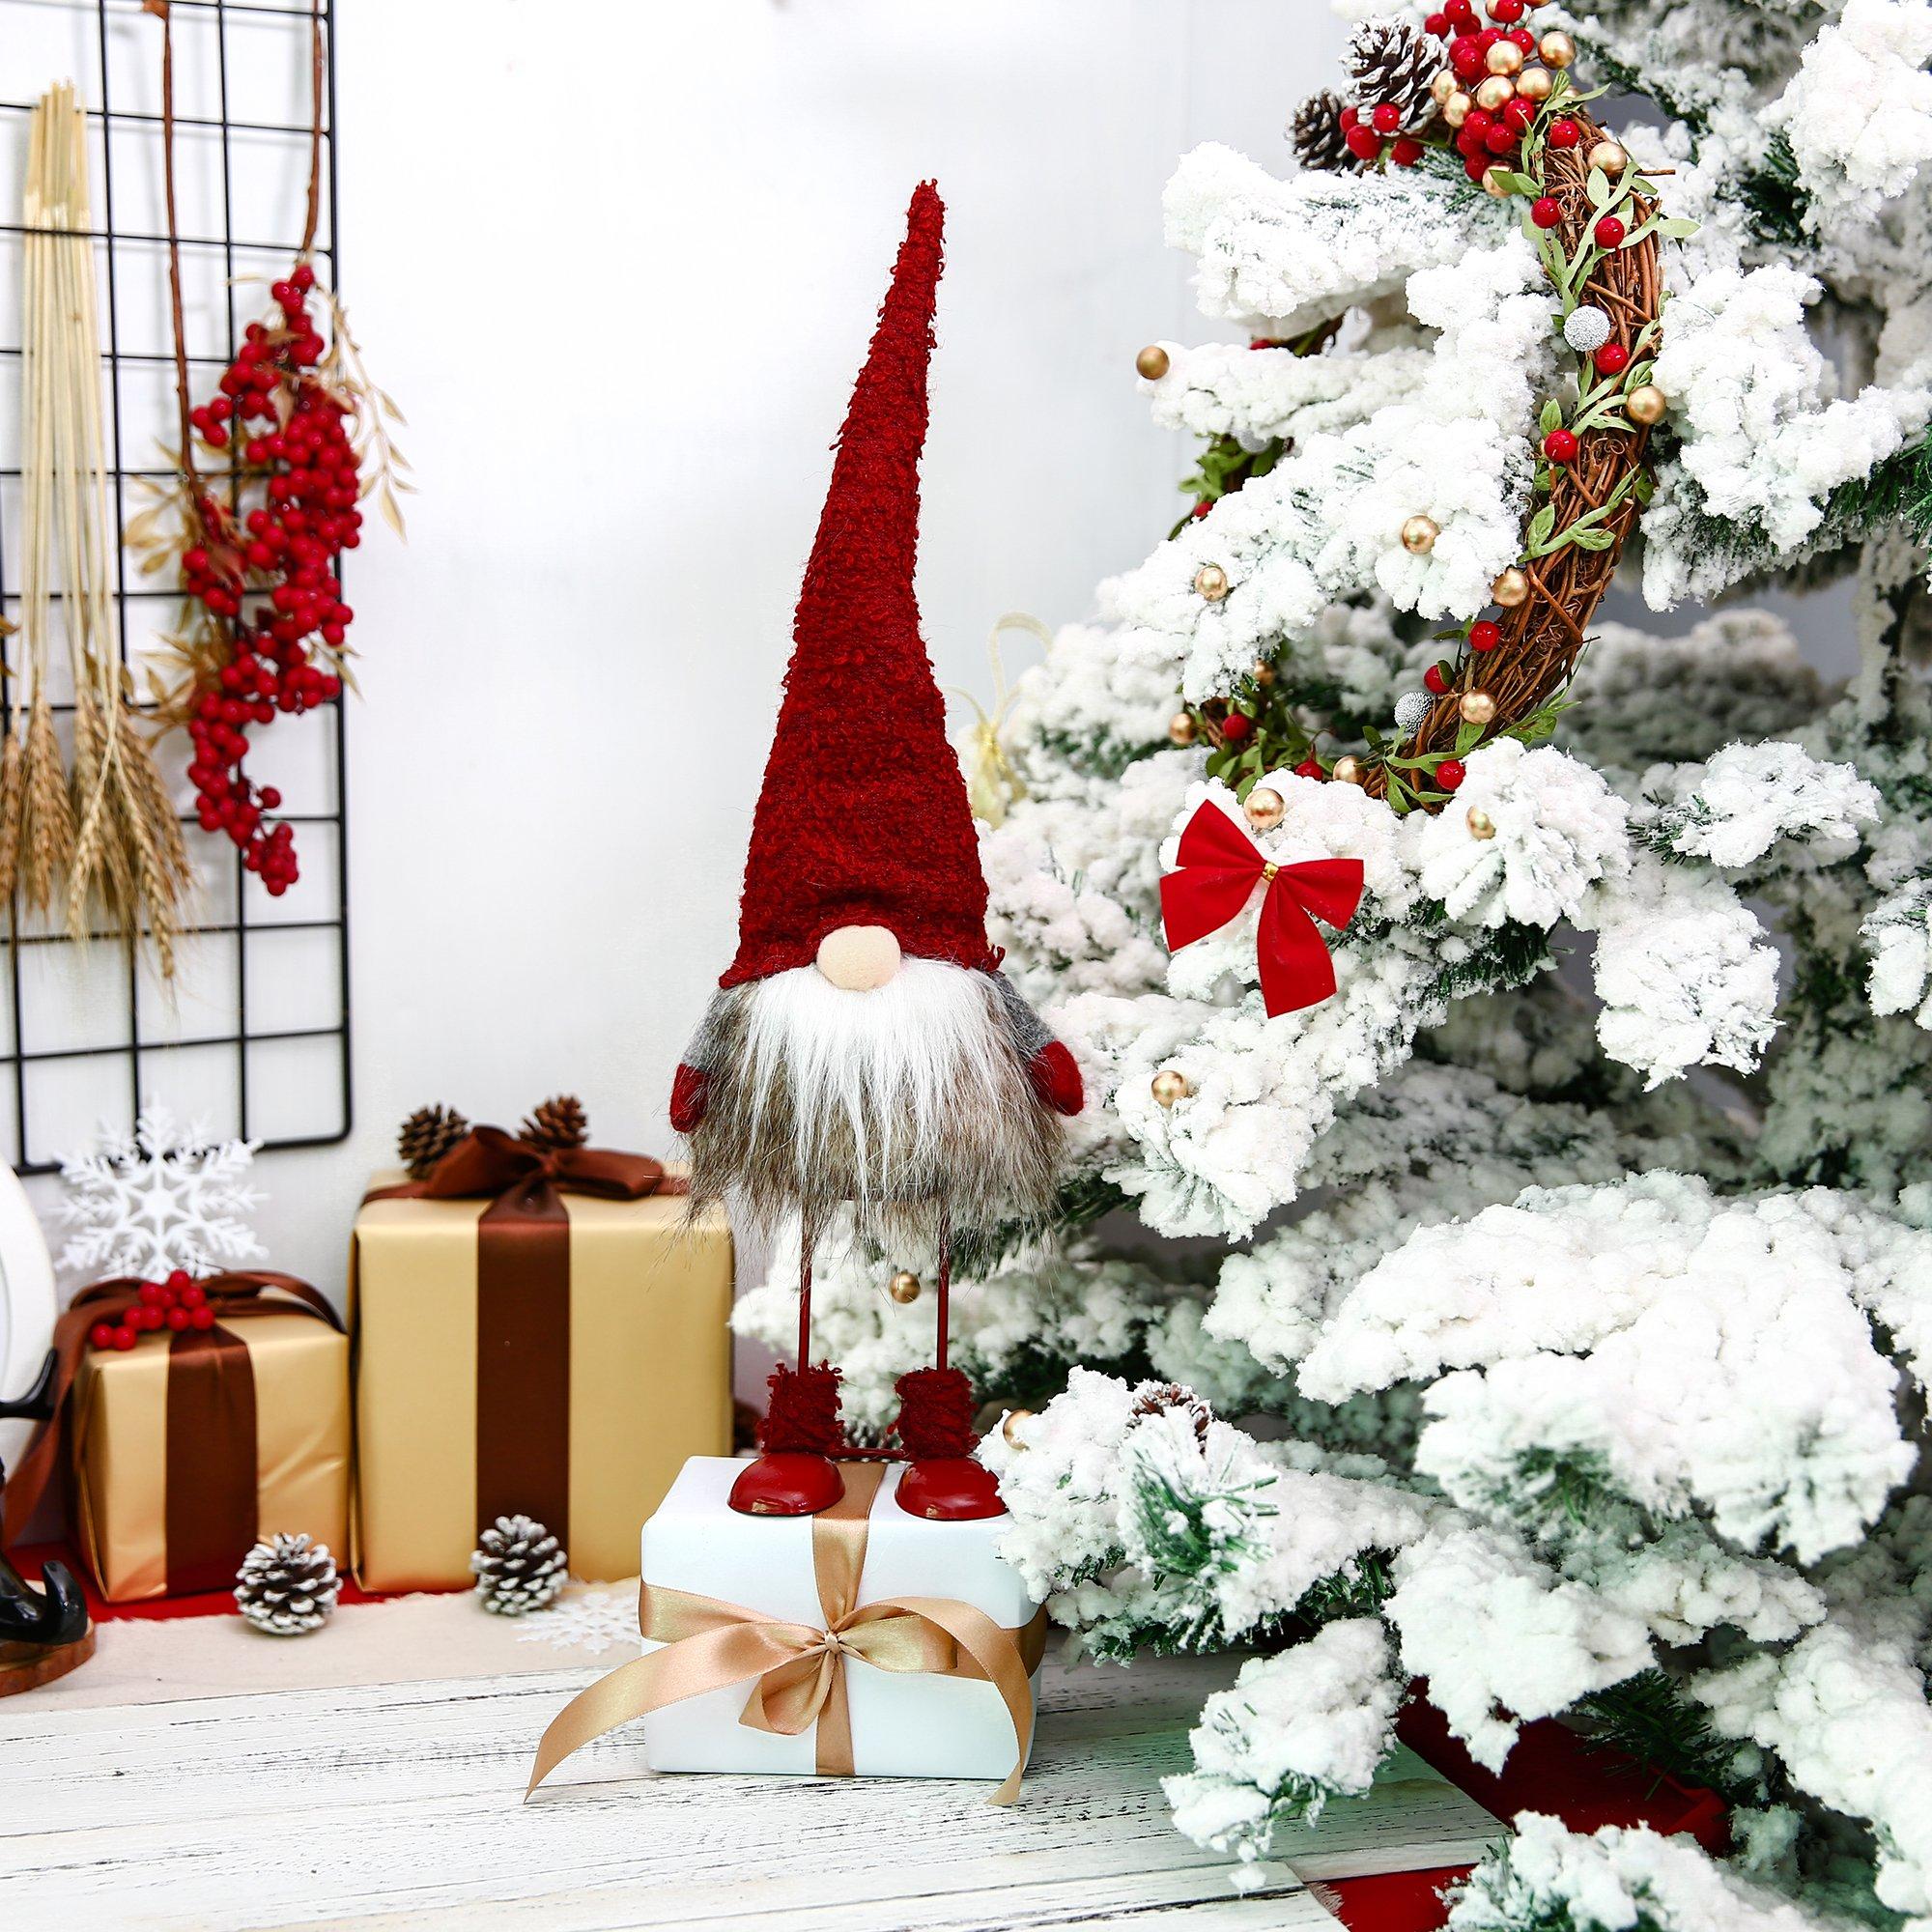 Christmas Decorations 10 Inches ITOMTE Handmade Swedish Gnome Holiday Presents Yule Santa Nisse 2 Pcs Winter Table Ornament Home Decor Nordic Figurine Plush Elf Toy Scandinavian Tomte